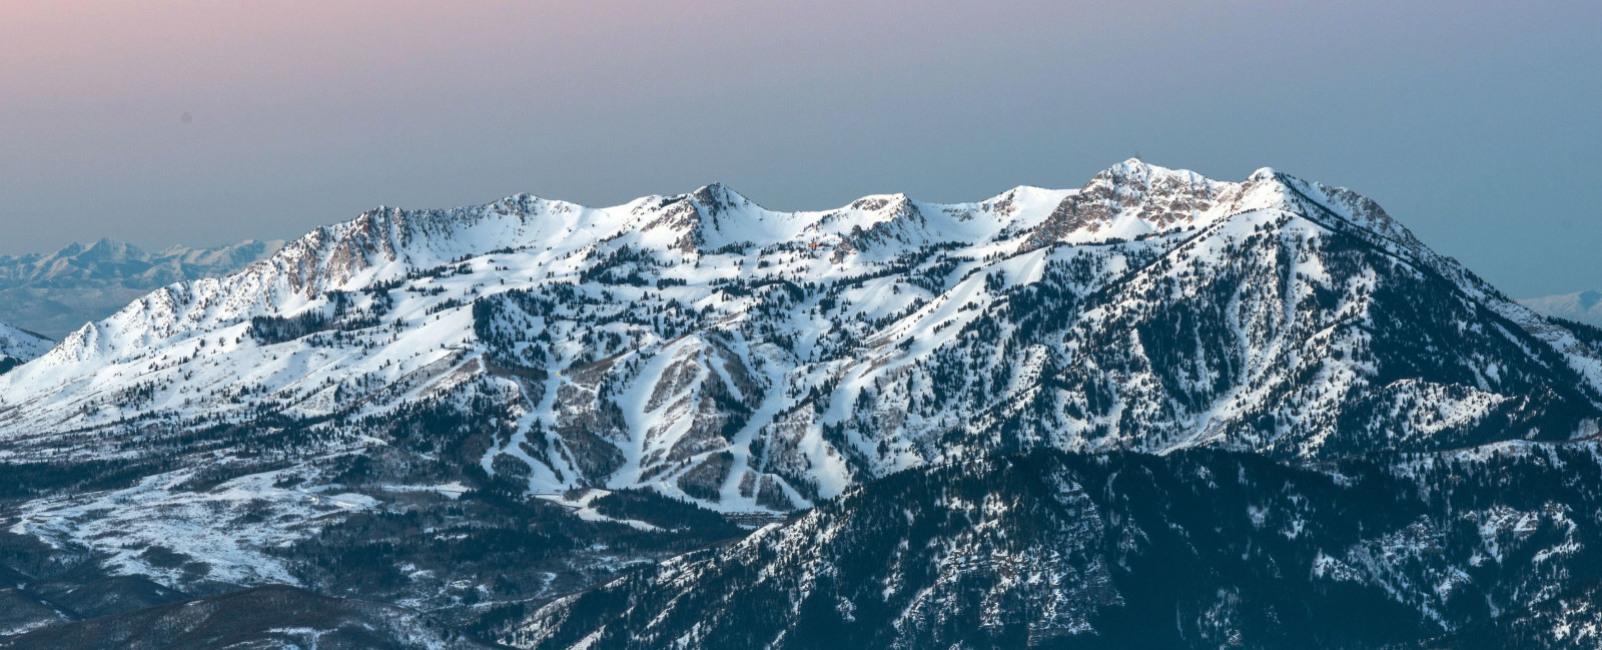 Ski & Ride FREE at Snowbasin This Spring!